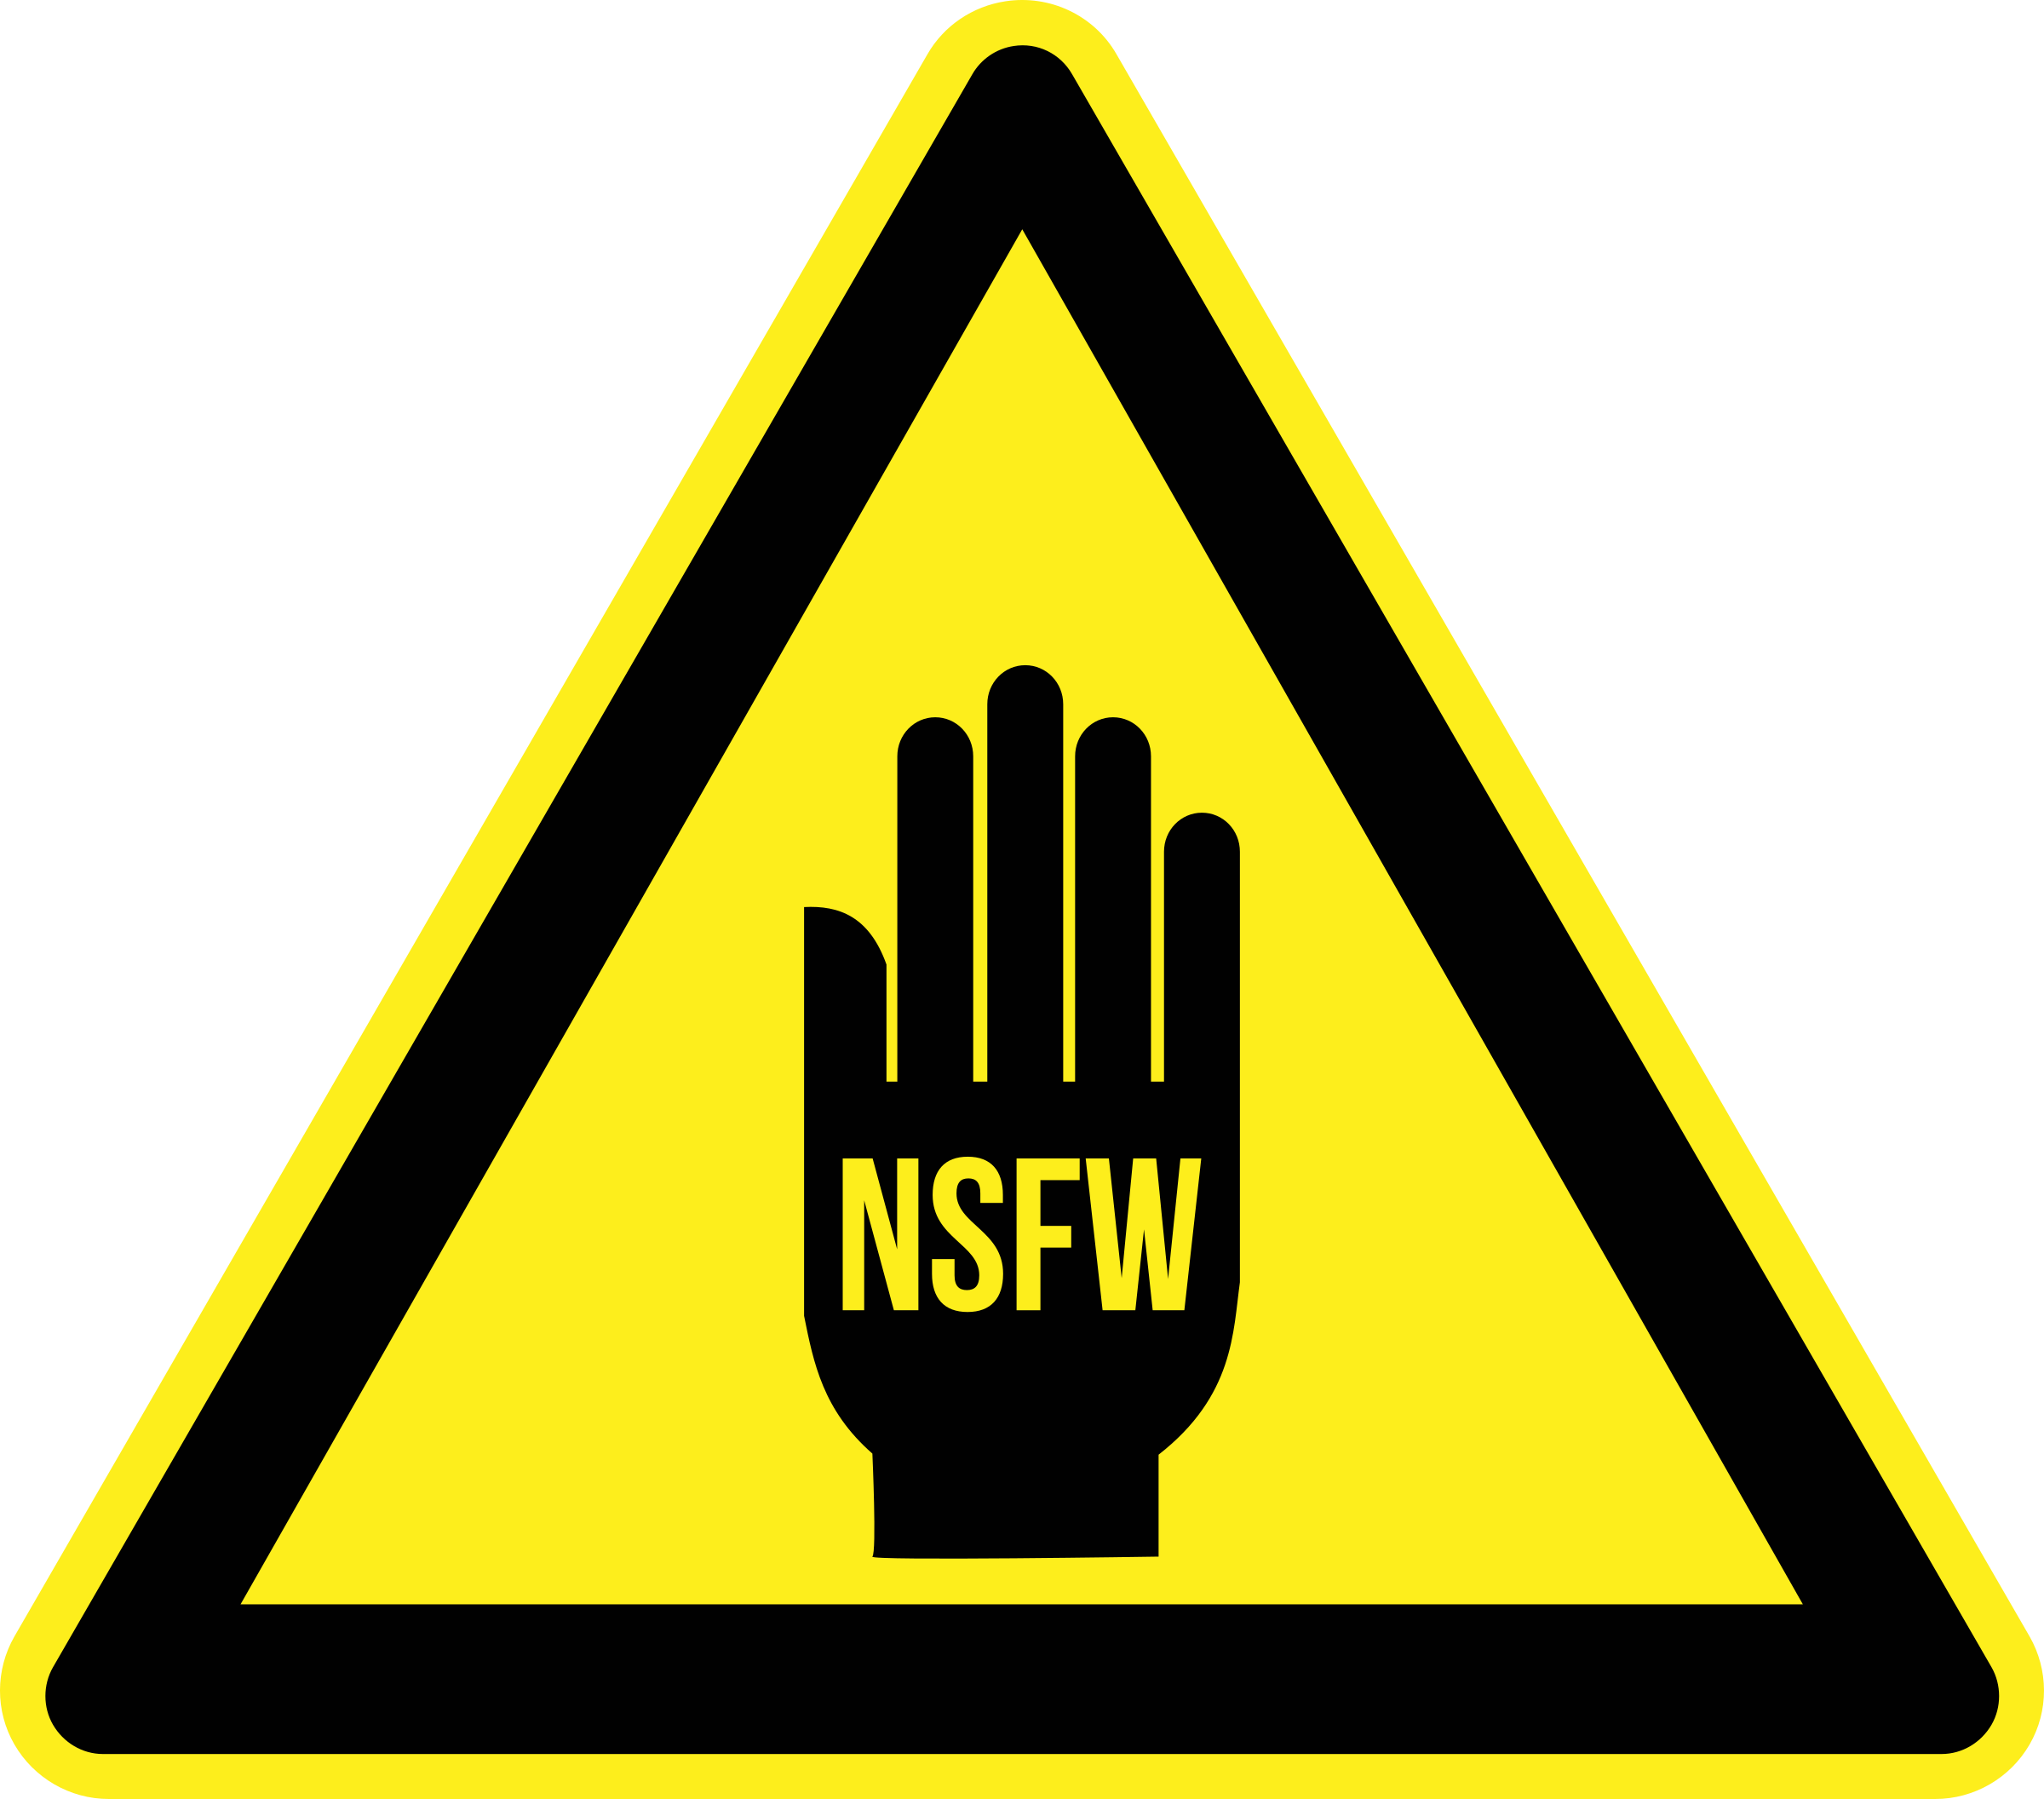 nsfw-sign